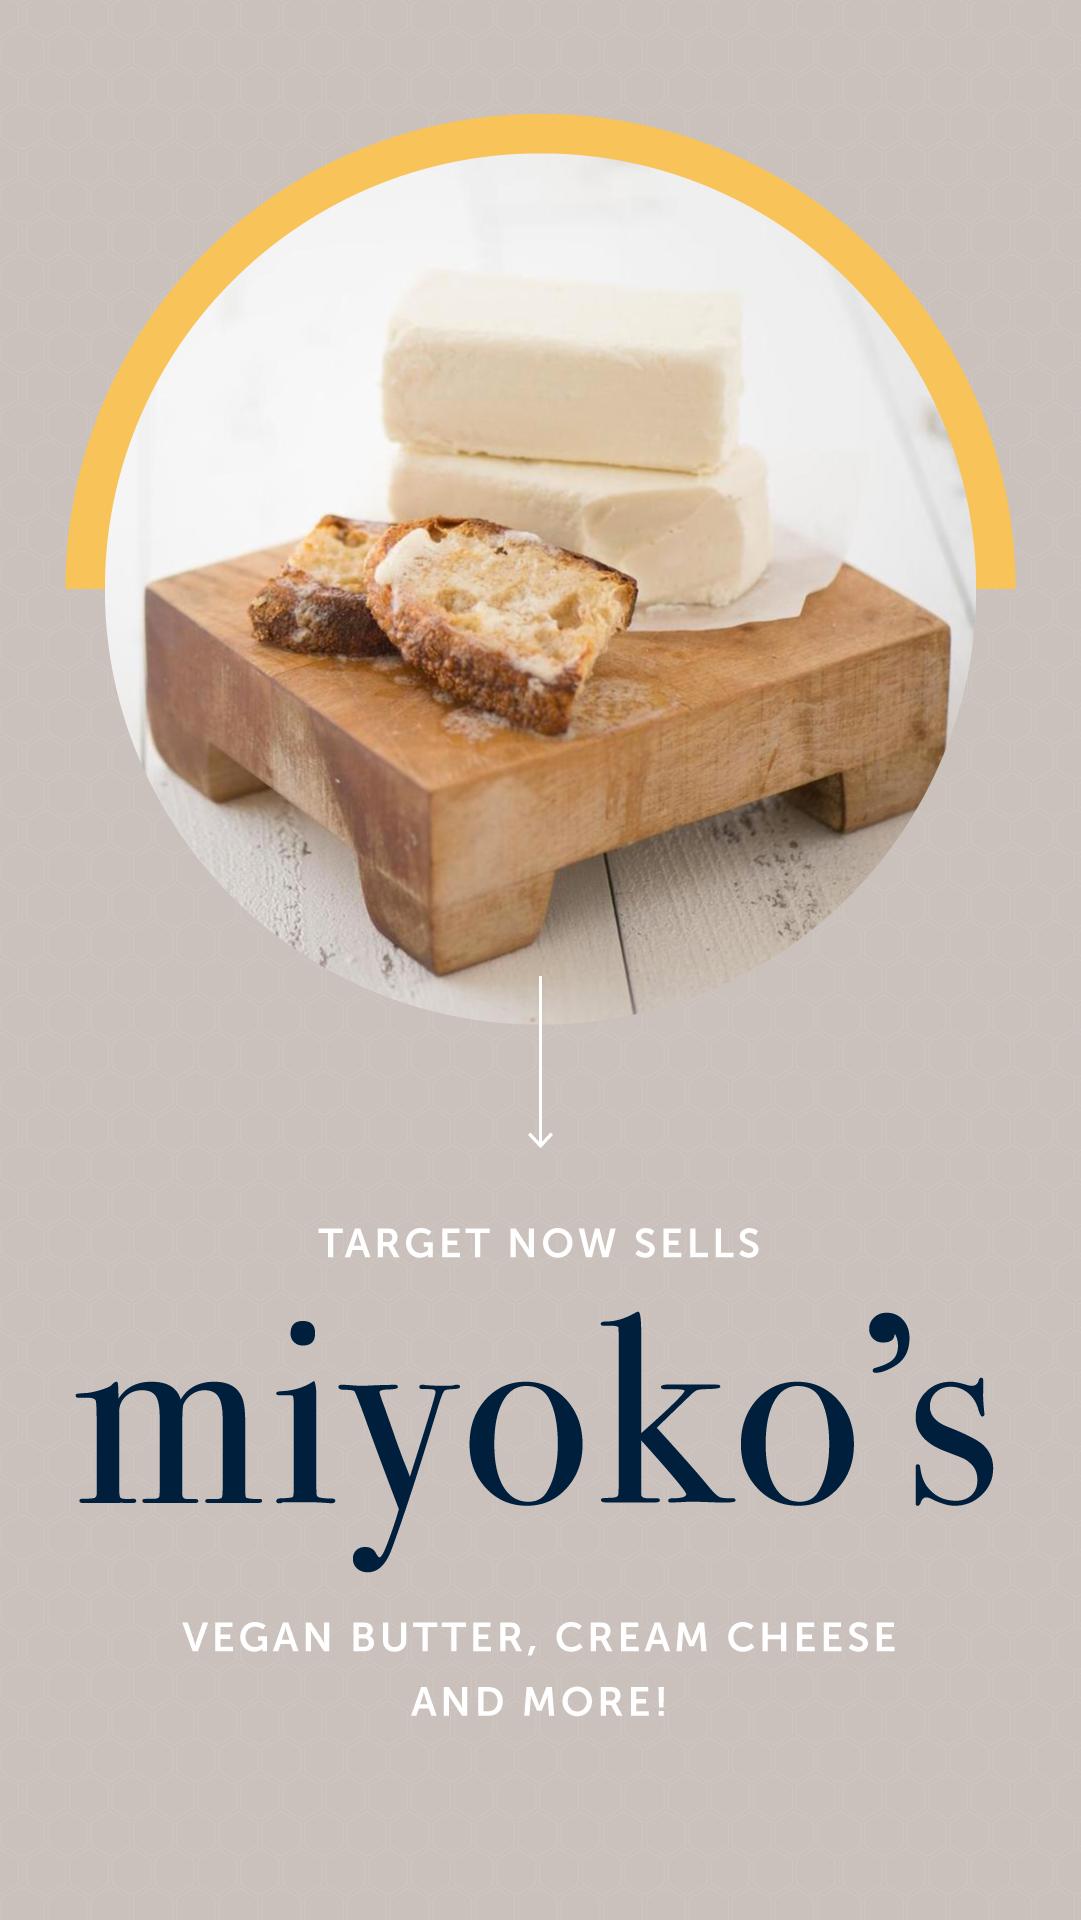 Target Now Sells Miyoko S Vegan Butter Cream Cheese And More Vegan Butter Cheese Cream Cheese